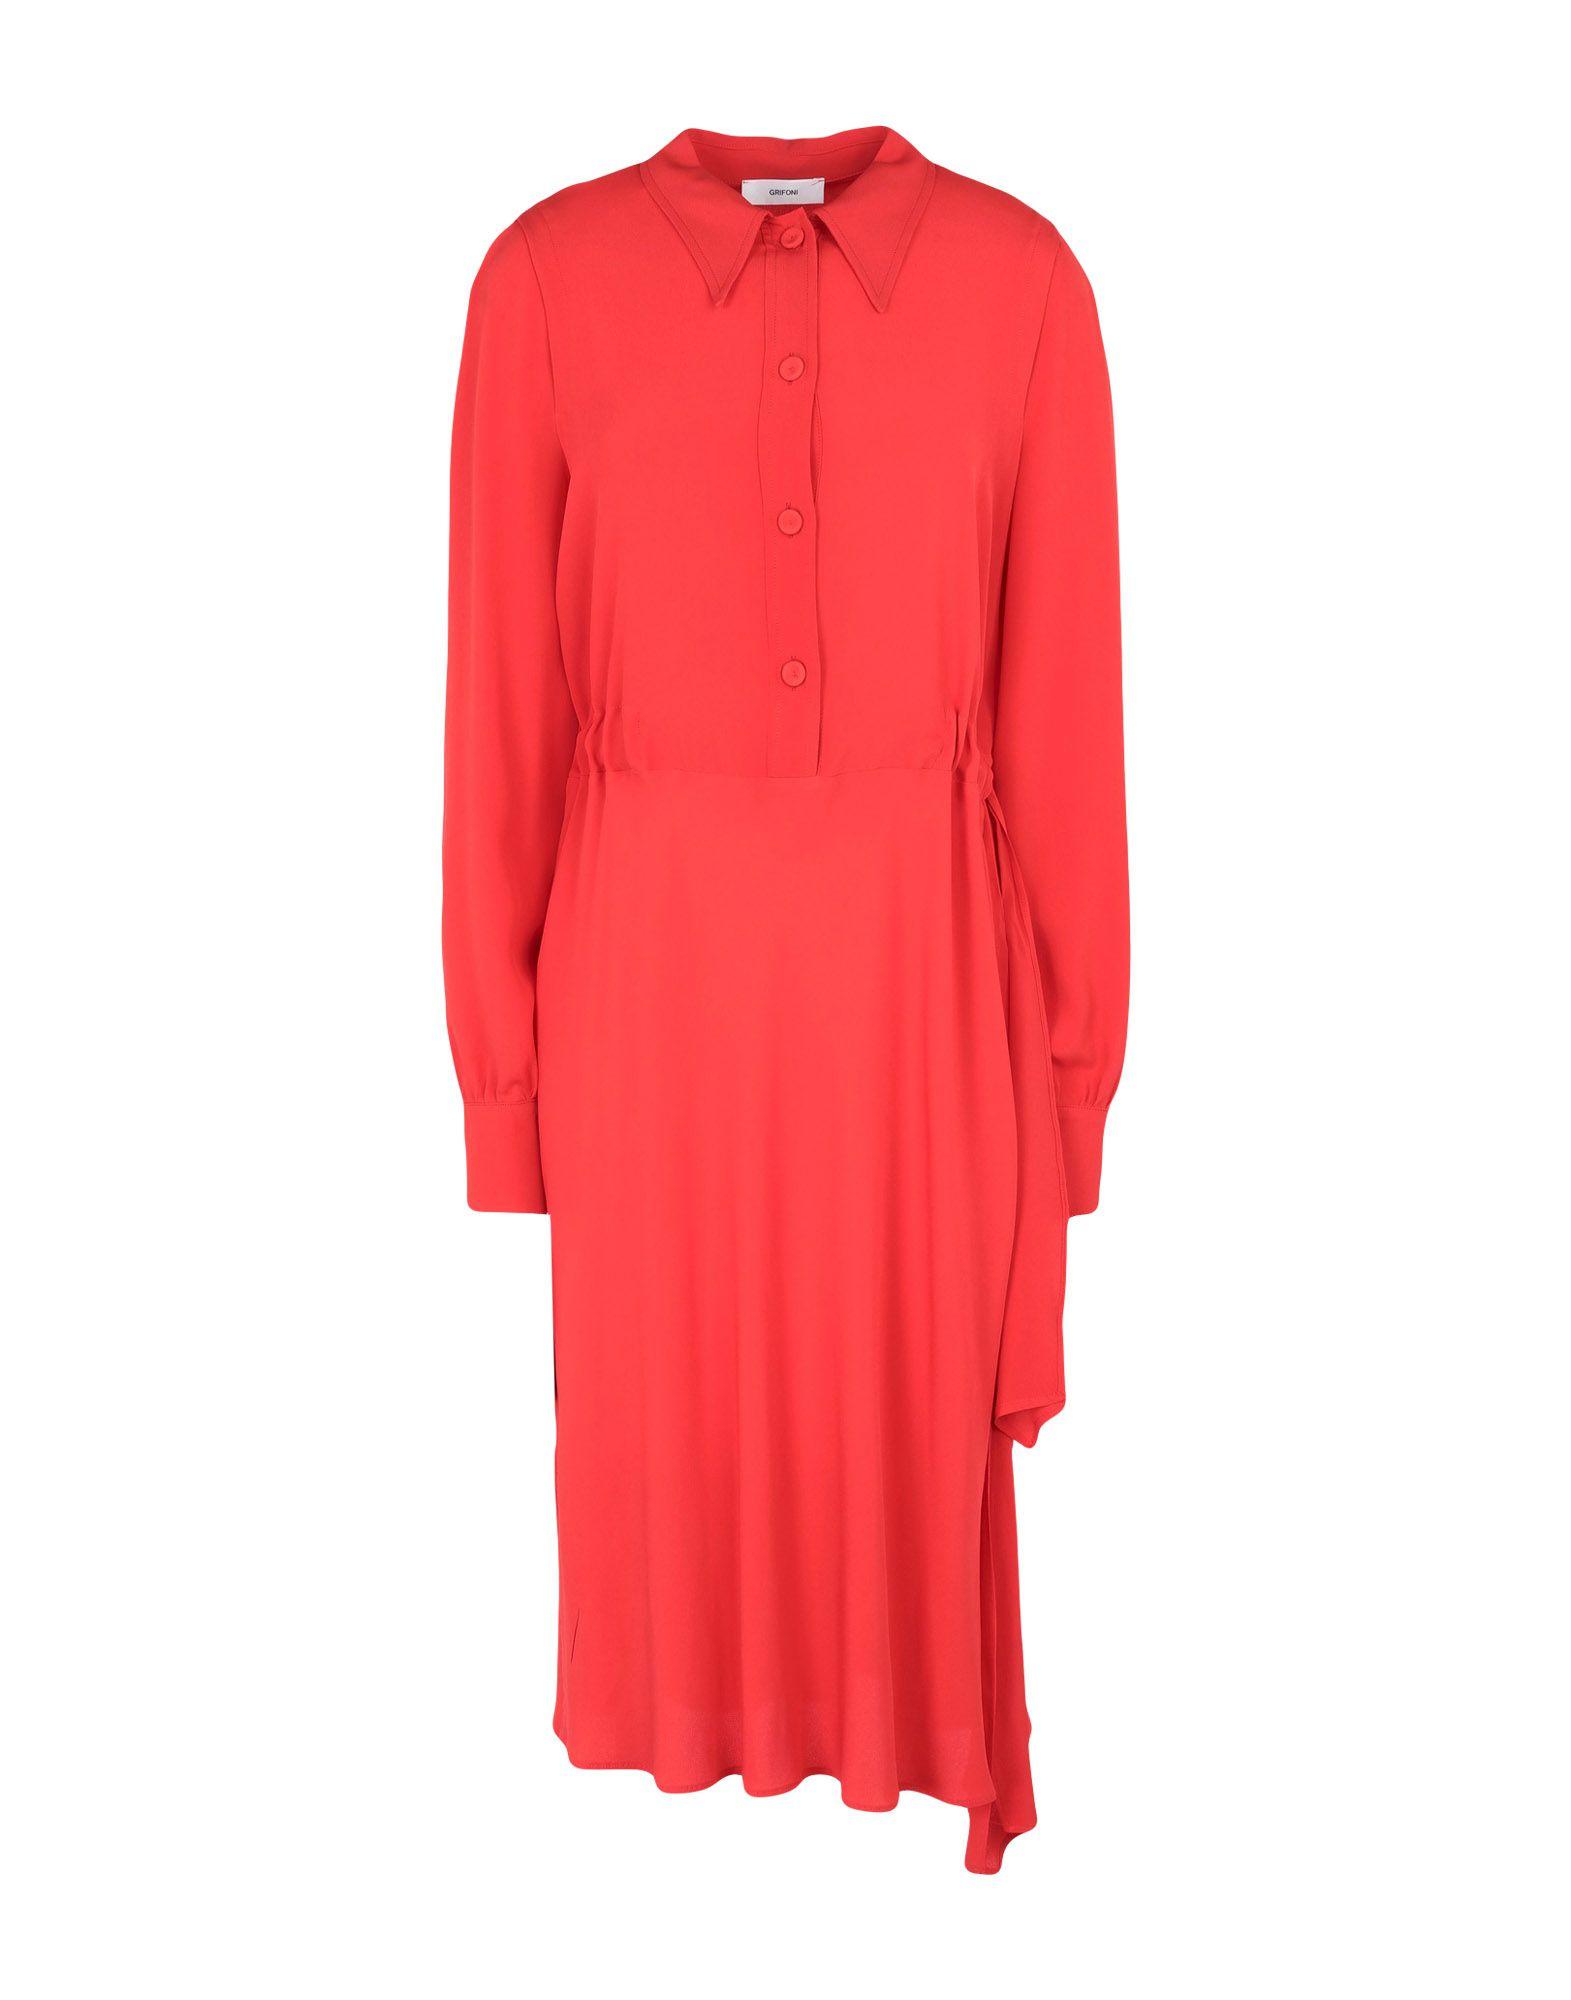 MAURO GRIFONI Платье до колена платье рубашка fox yulia sway платье рубашка fox